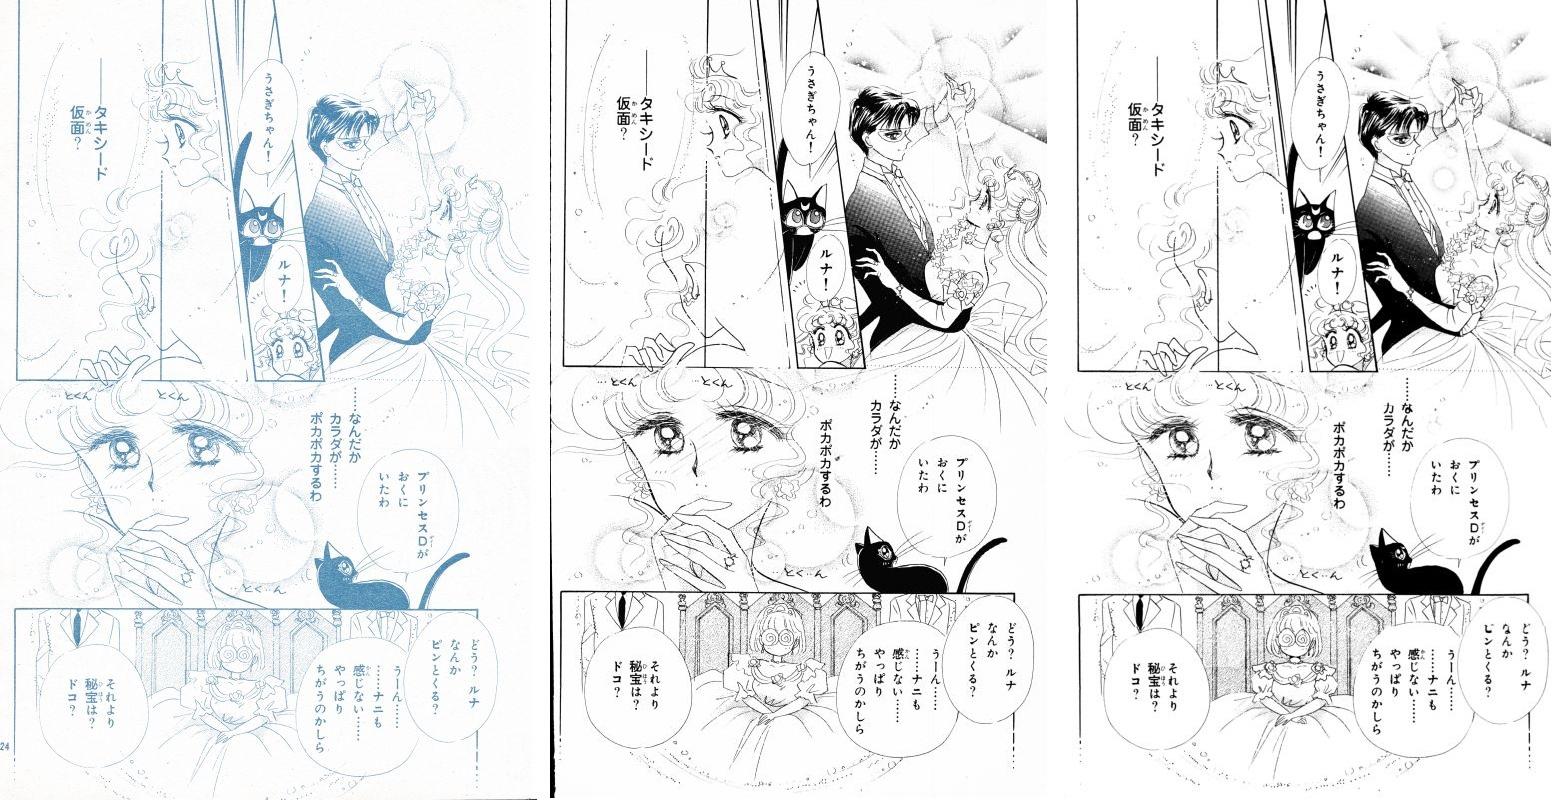 Act 4, Page 21 – Nakayoshi, Original, Remaster